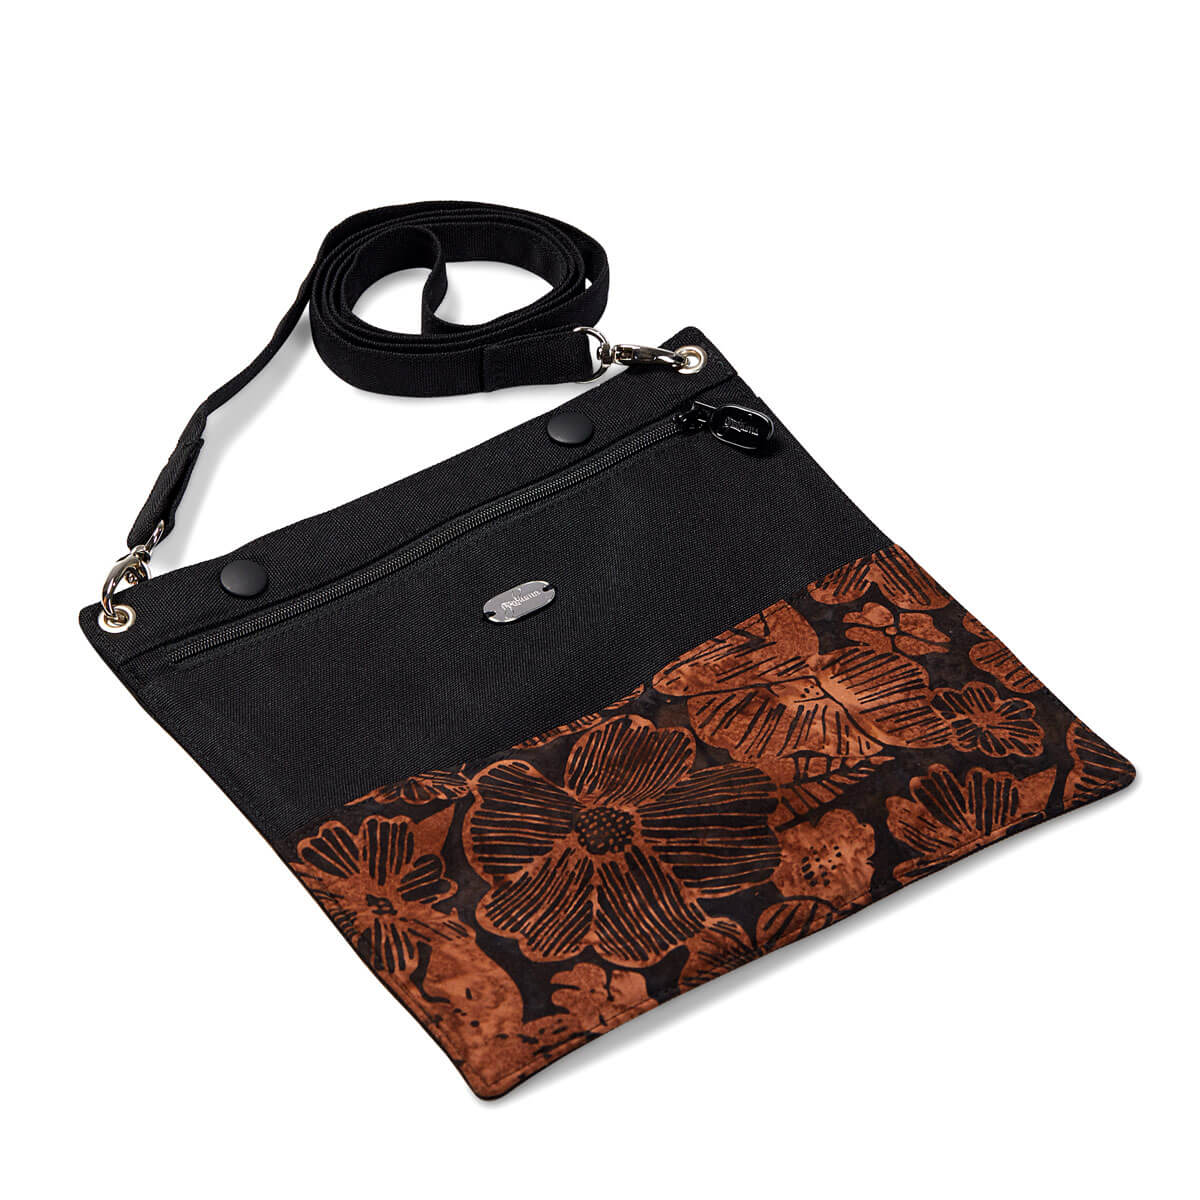 Tote-Bag-Set-Expresso-Bean-Detachable-Pocket